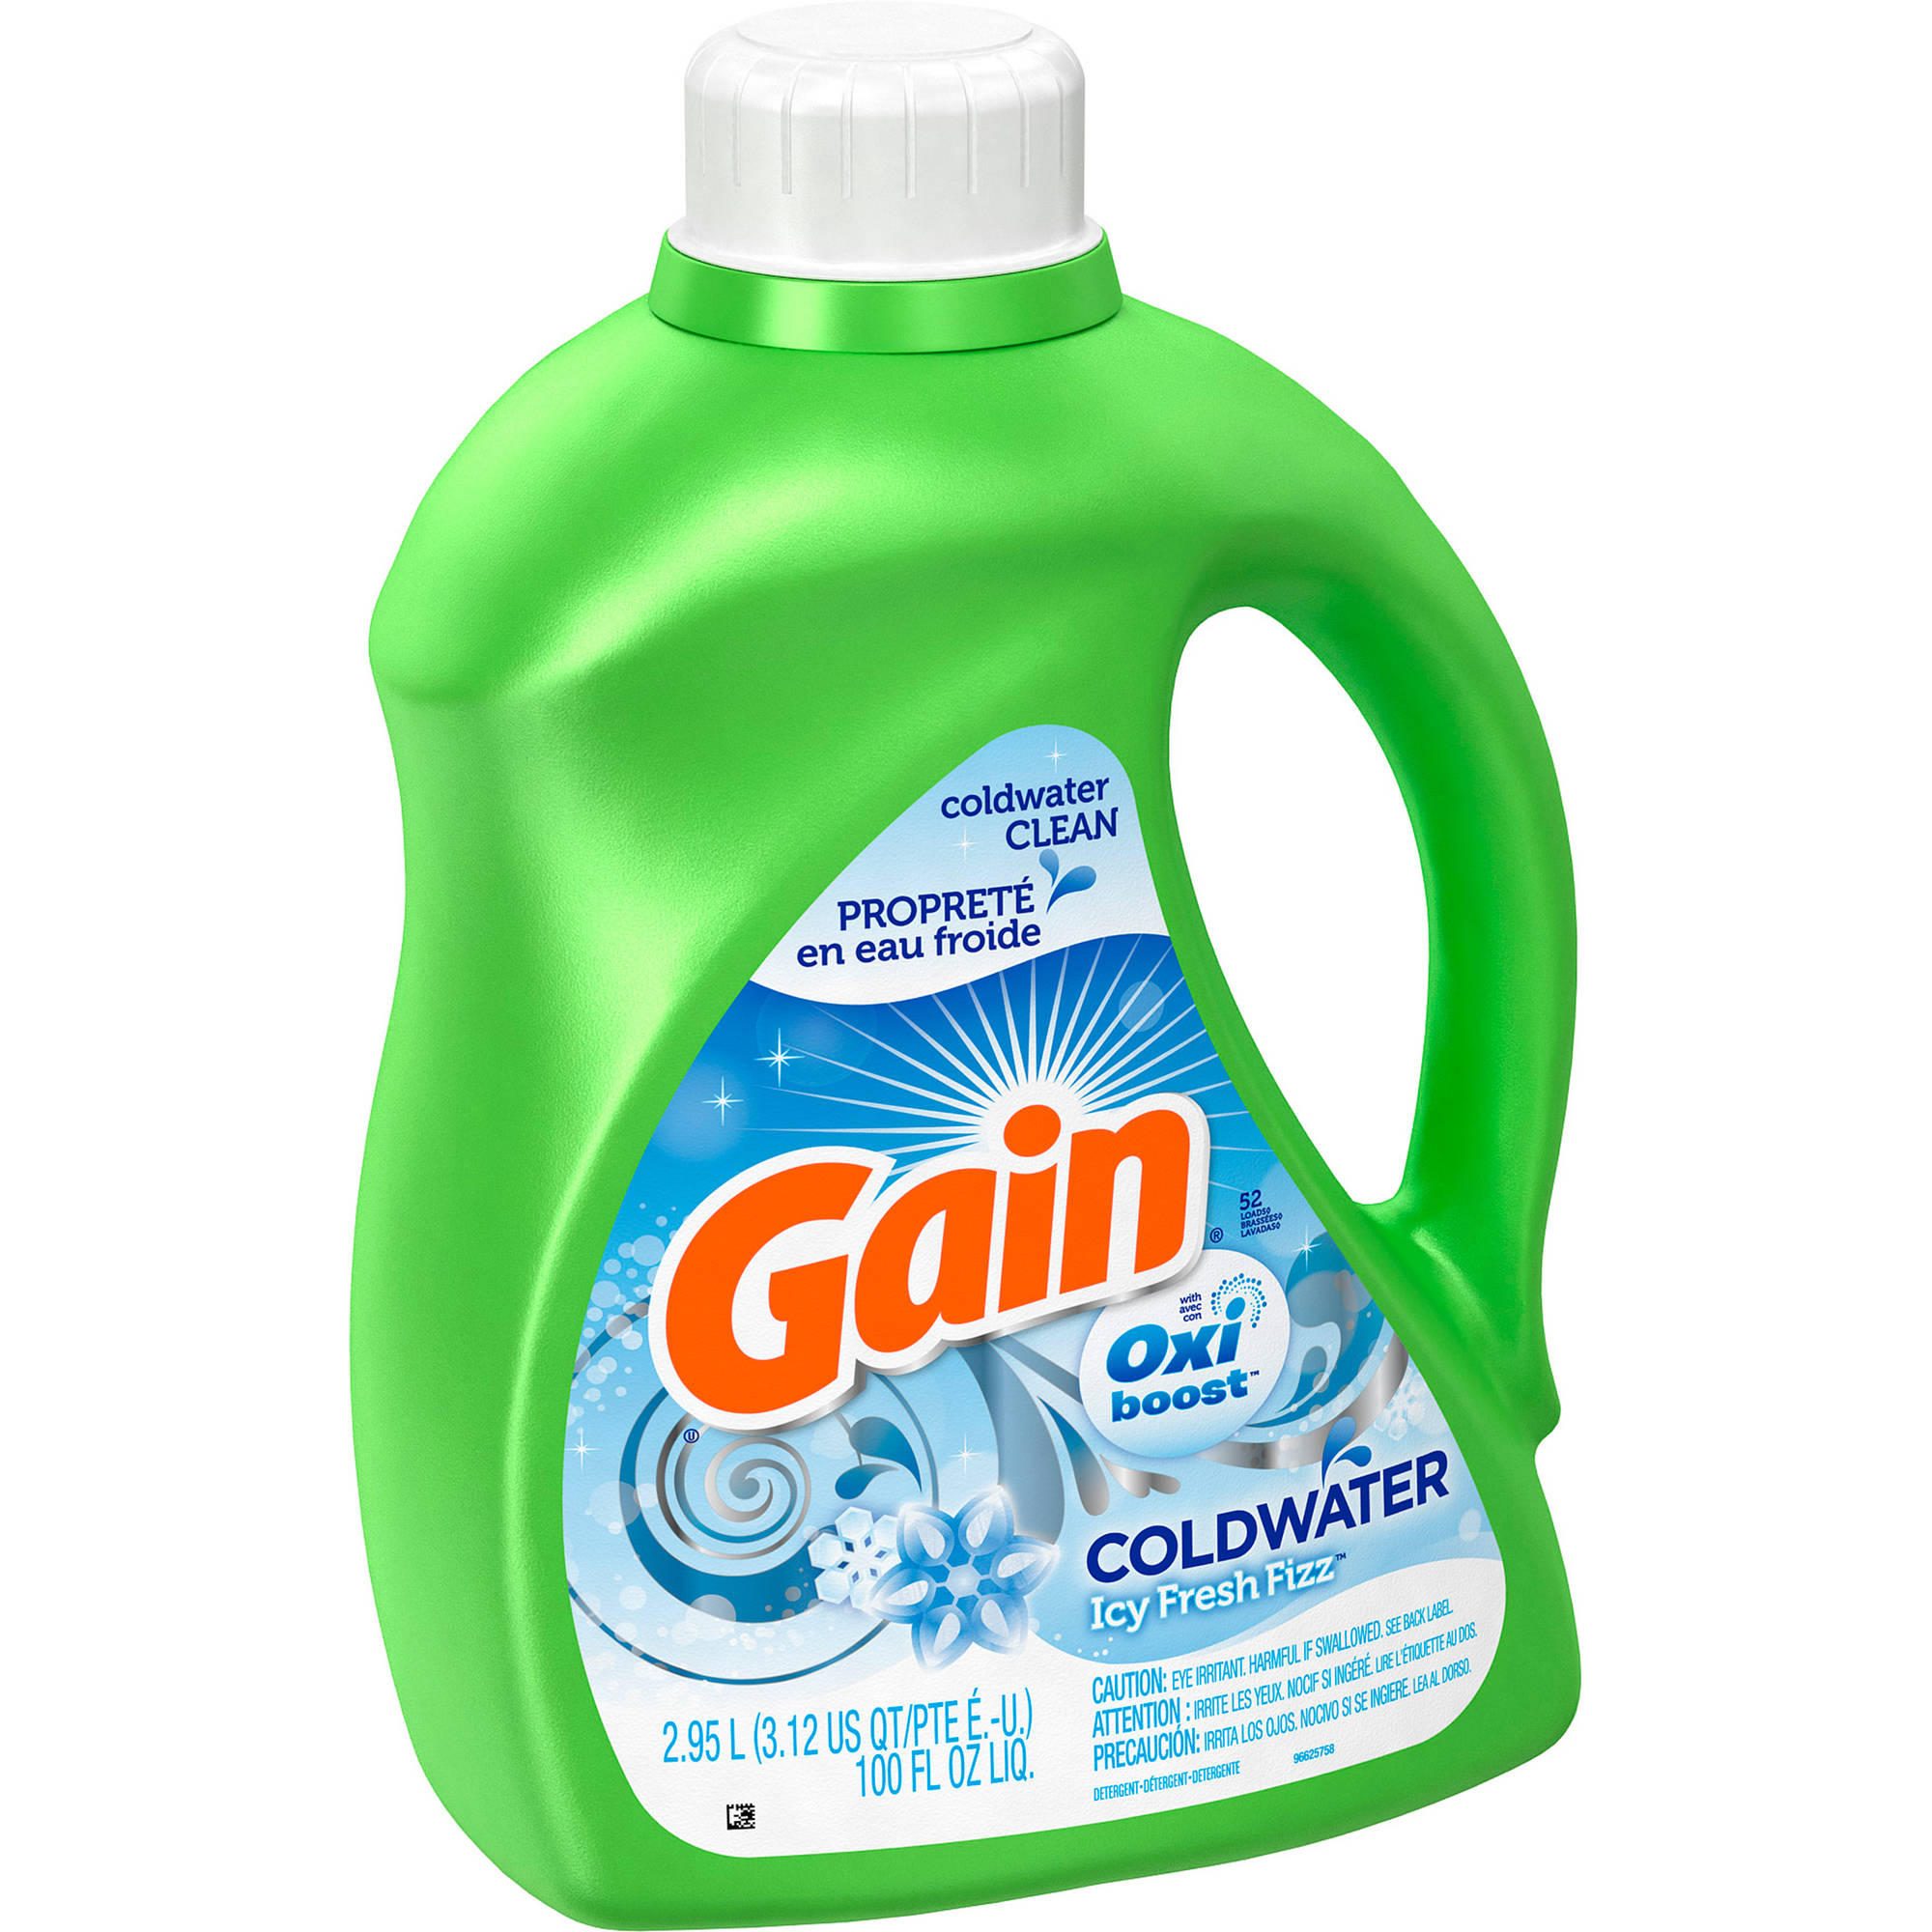 Gain Liquid Laundry Detergent, Icy Fresh Fizz Coldwater, 52 Loads, 100 fl oz